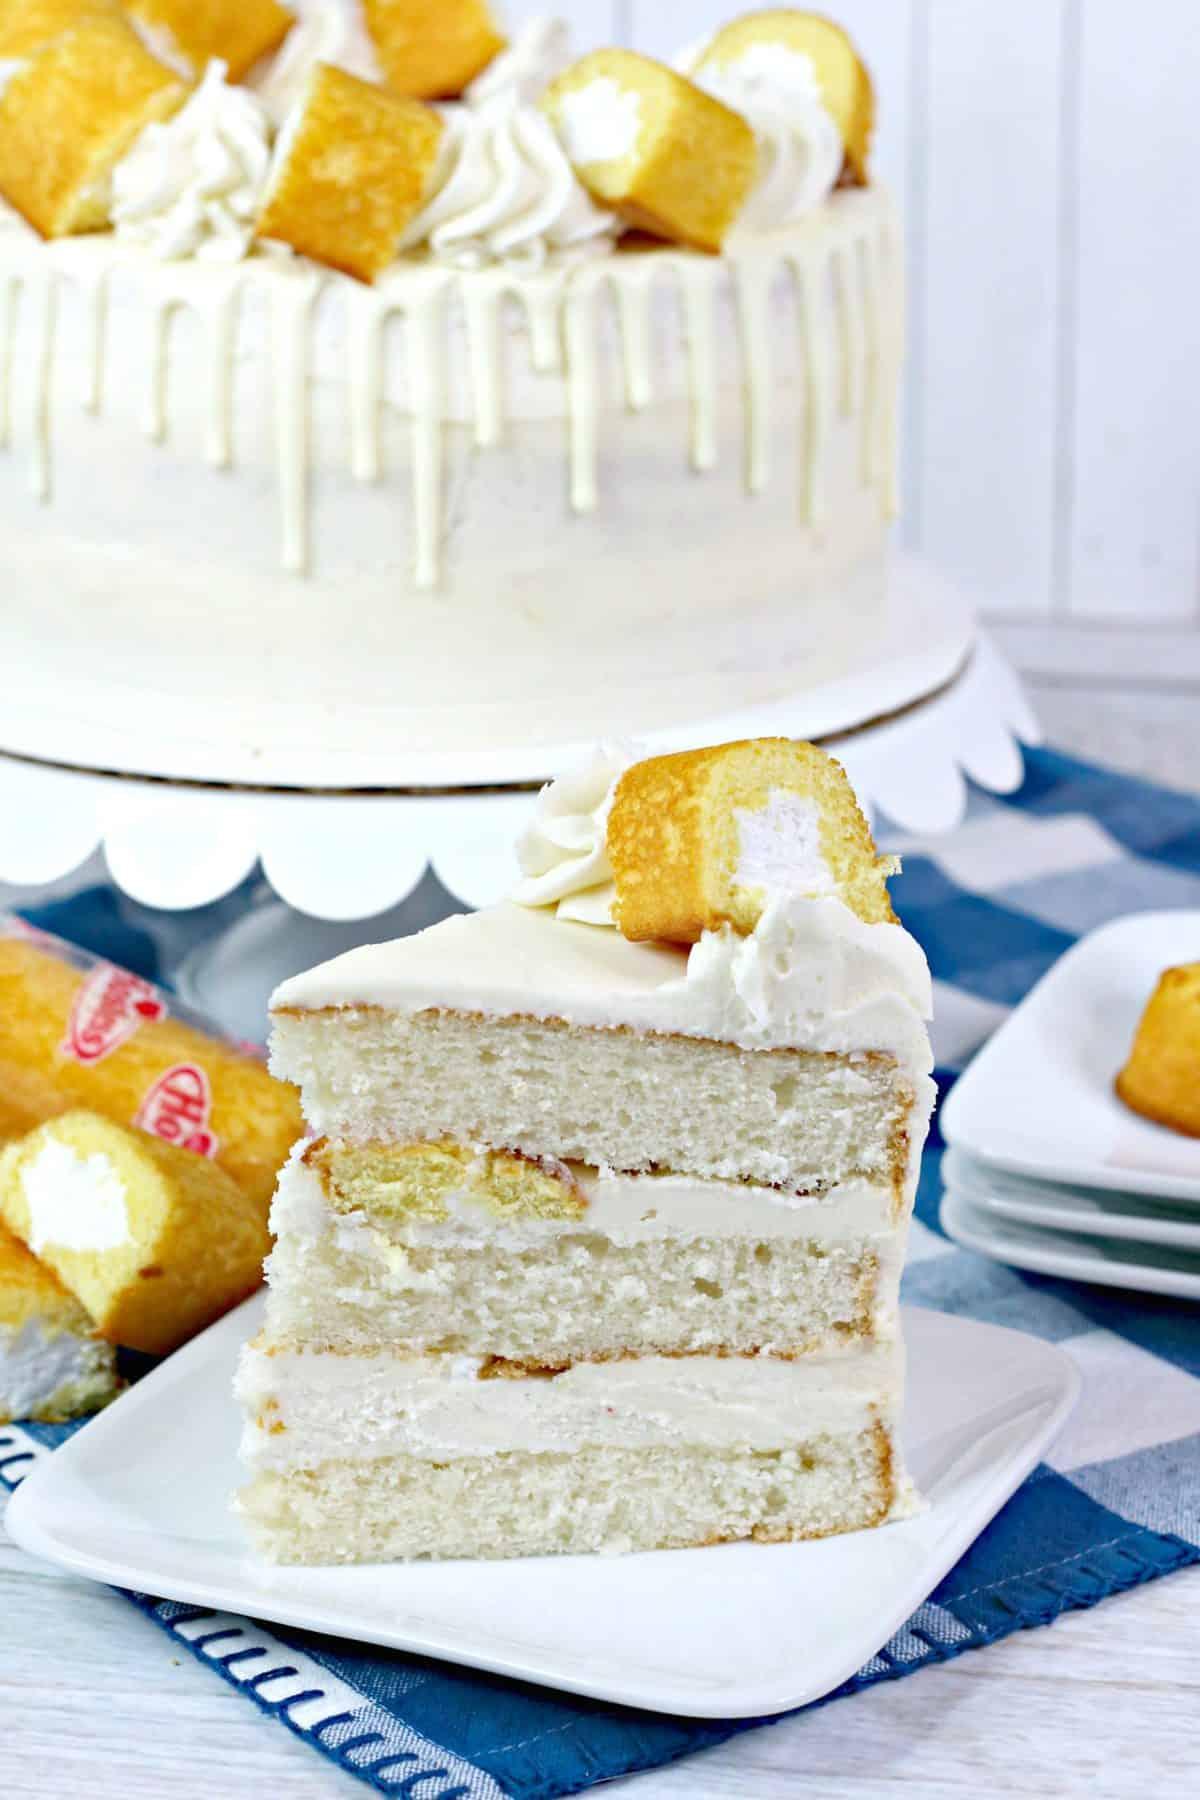 twinkie dessert, yellow cake recipe ideas